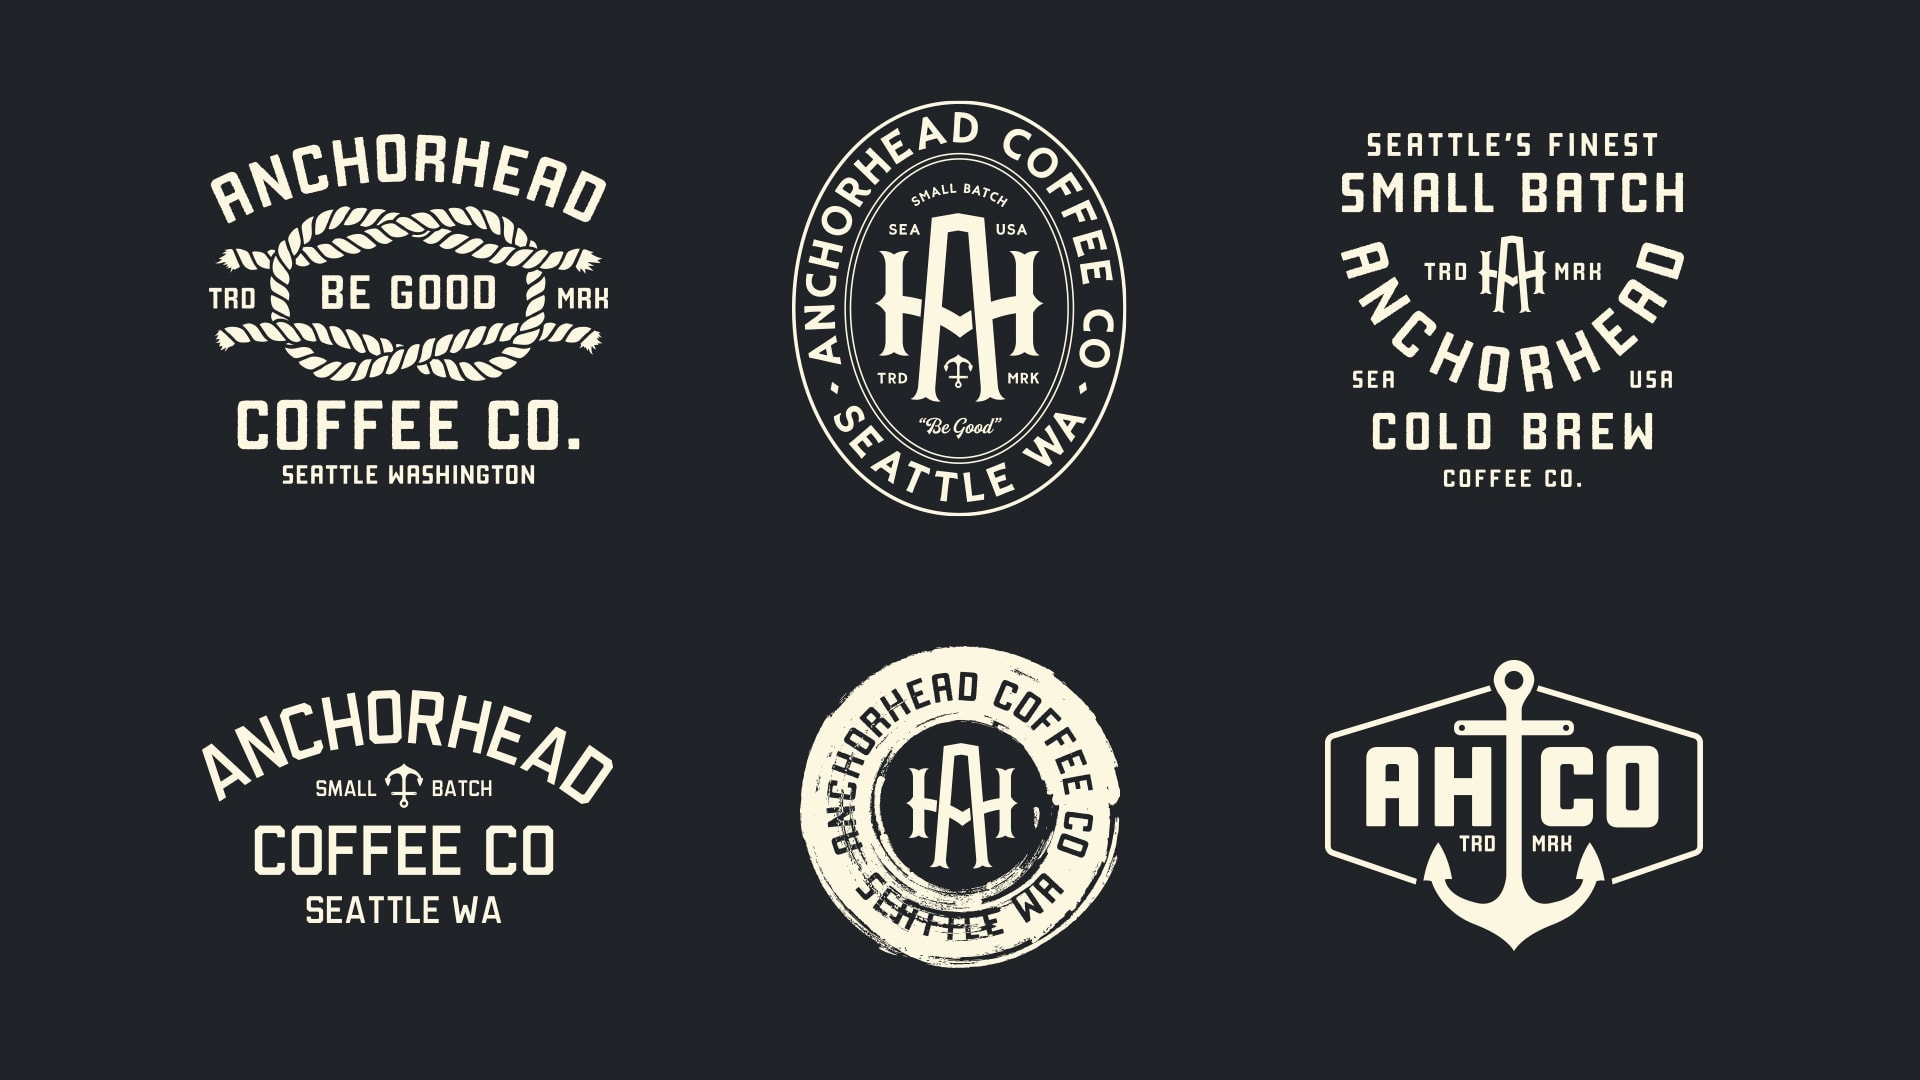 Anchorhead Coffee Shirt Designs - Unsung Studio Branding